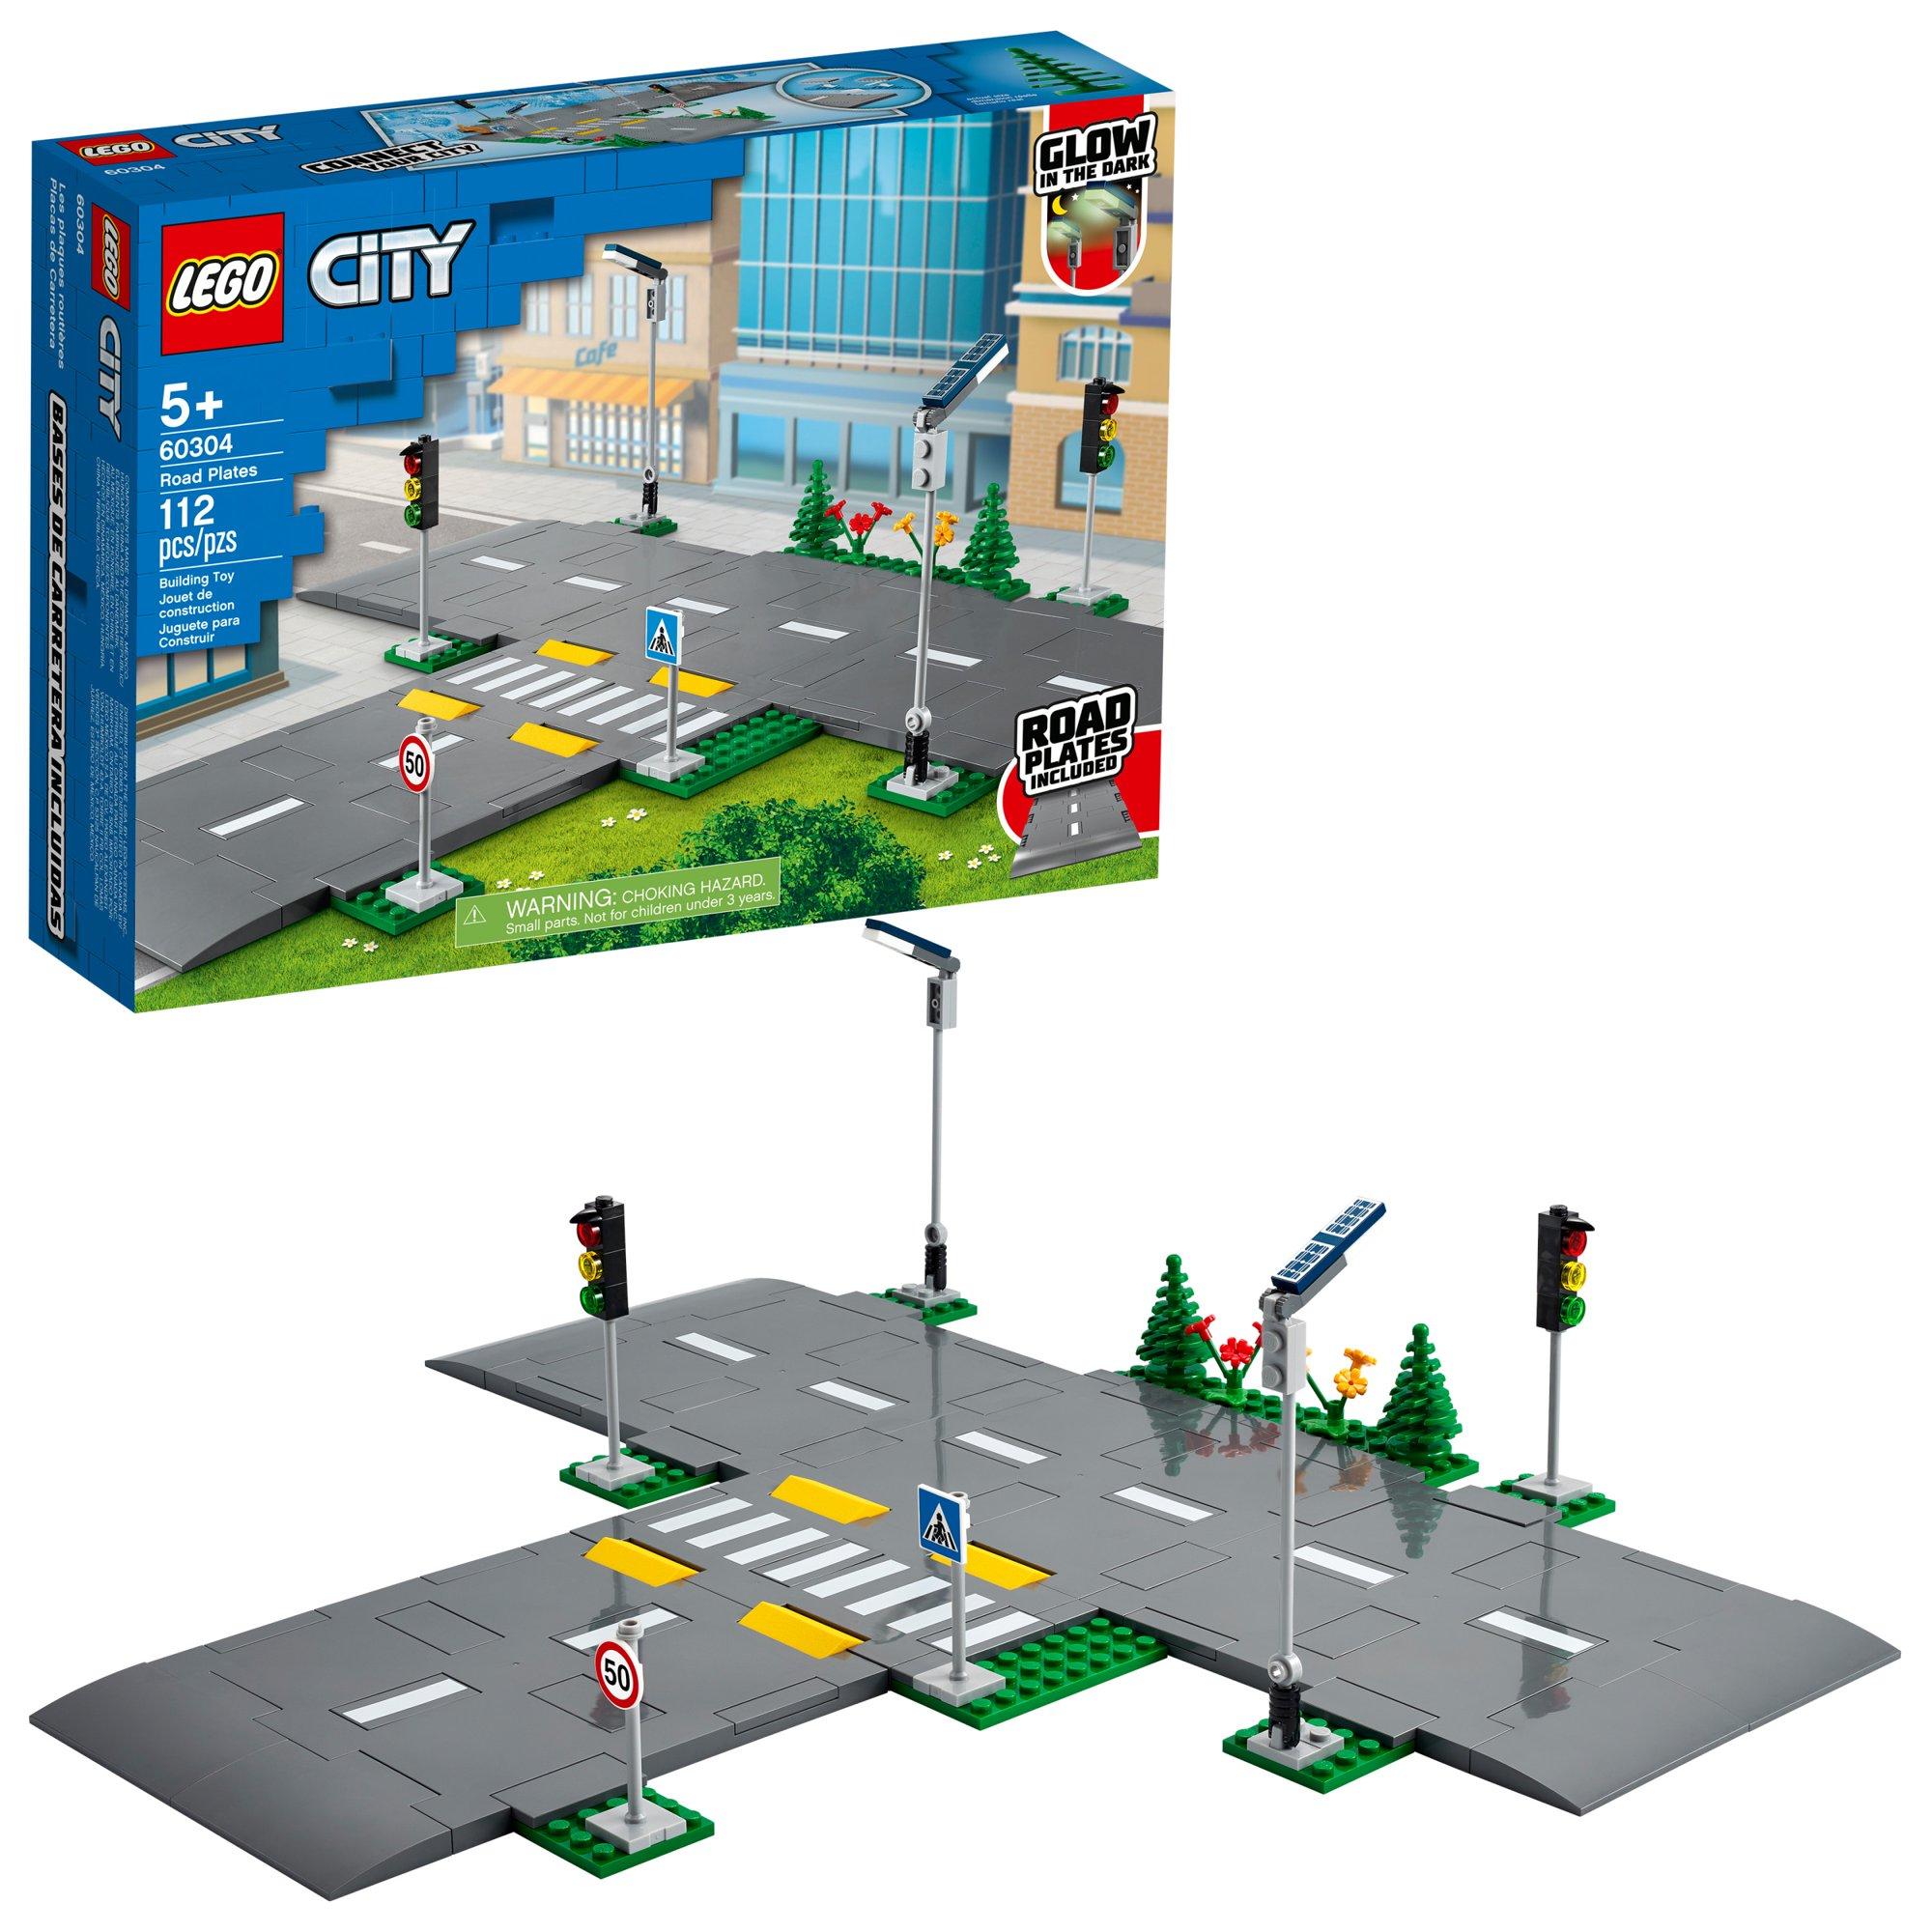 LEGO City Road Plates 60304 (112 Pieces) $11.04 YMMv